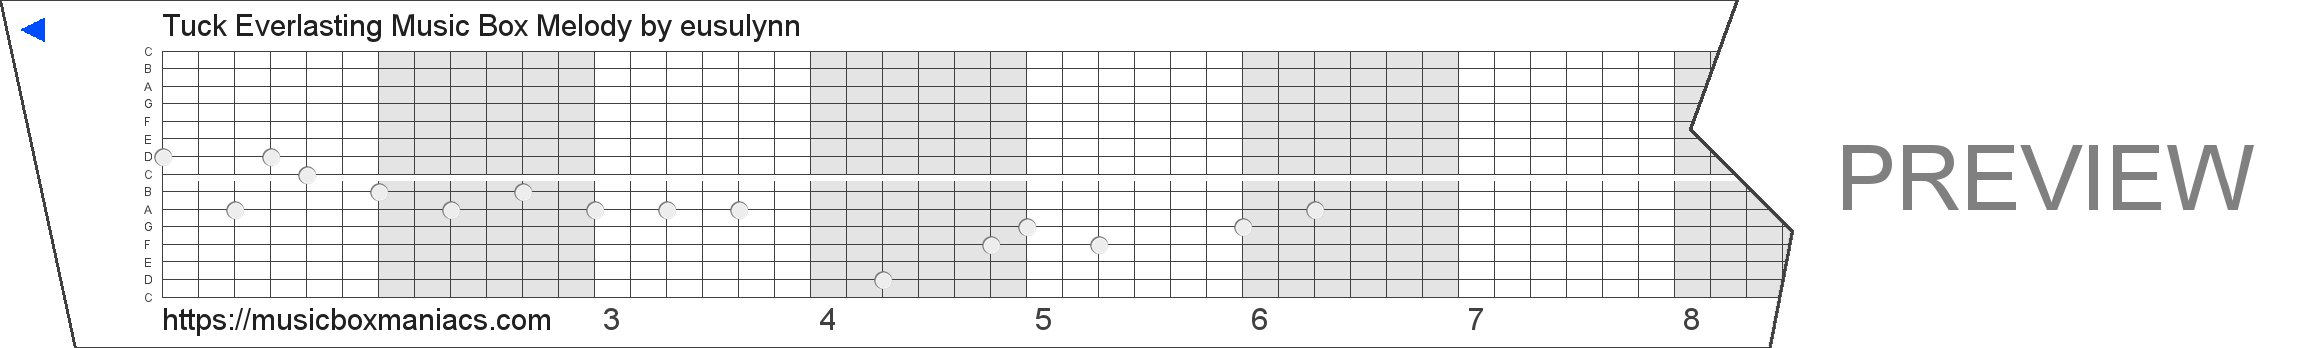 Tuck Everlasting Music Box Melody 15 note music box paper strip